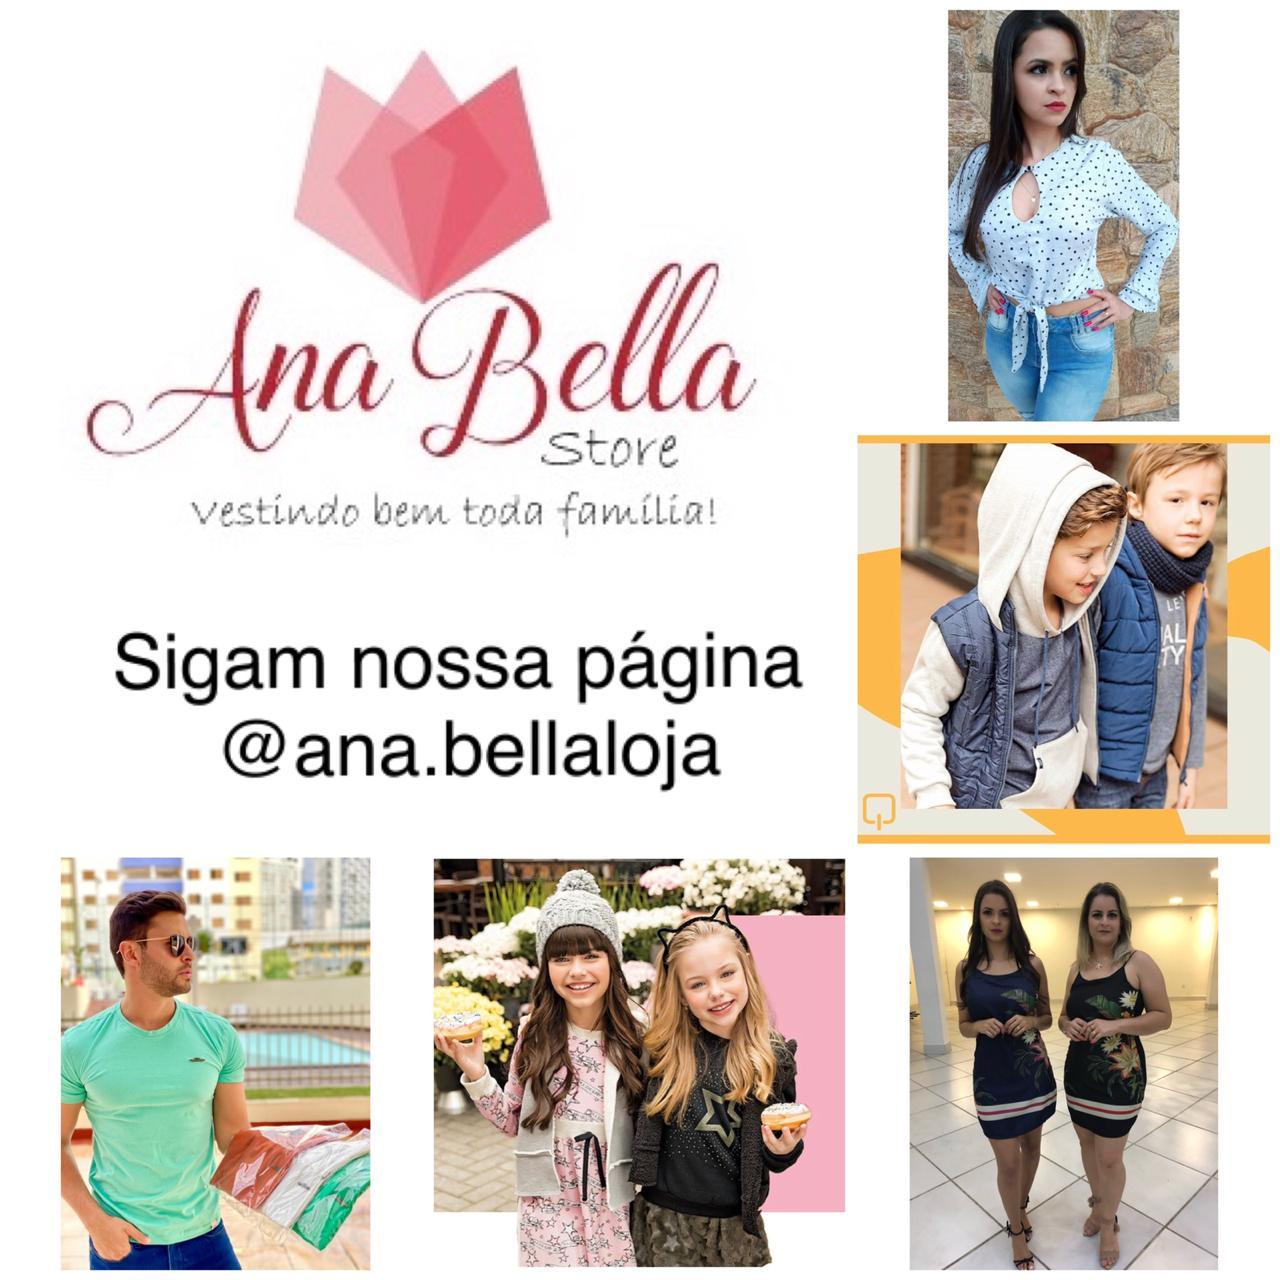 Ana Bella Store